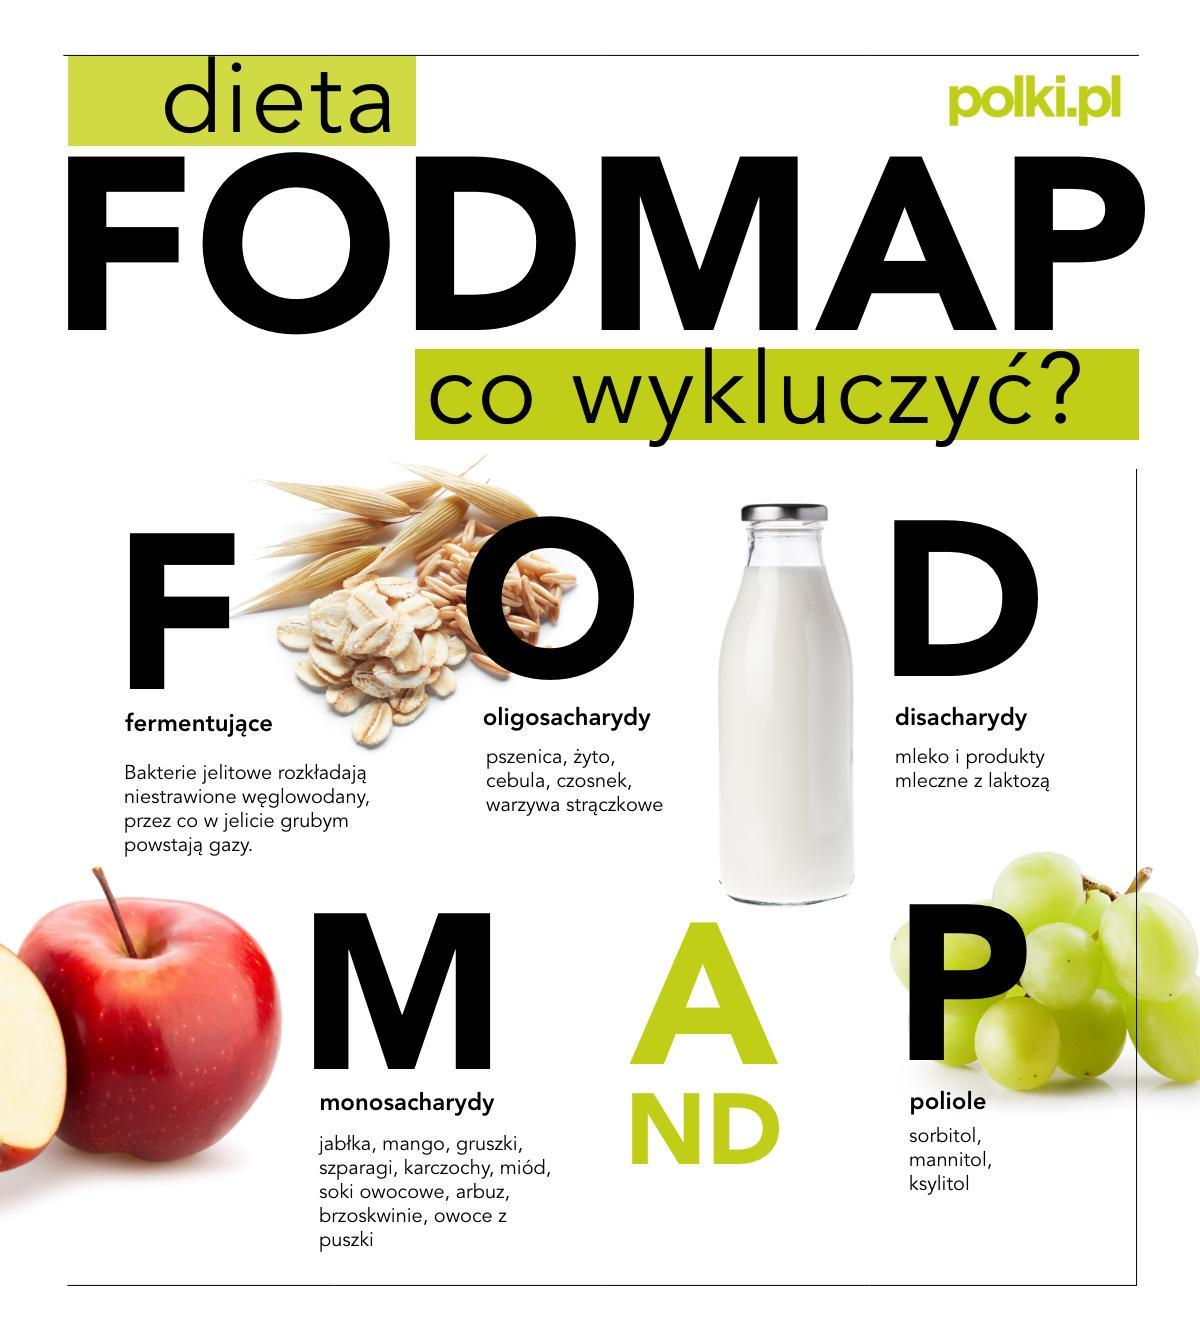 Dieta fodmap produkty